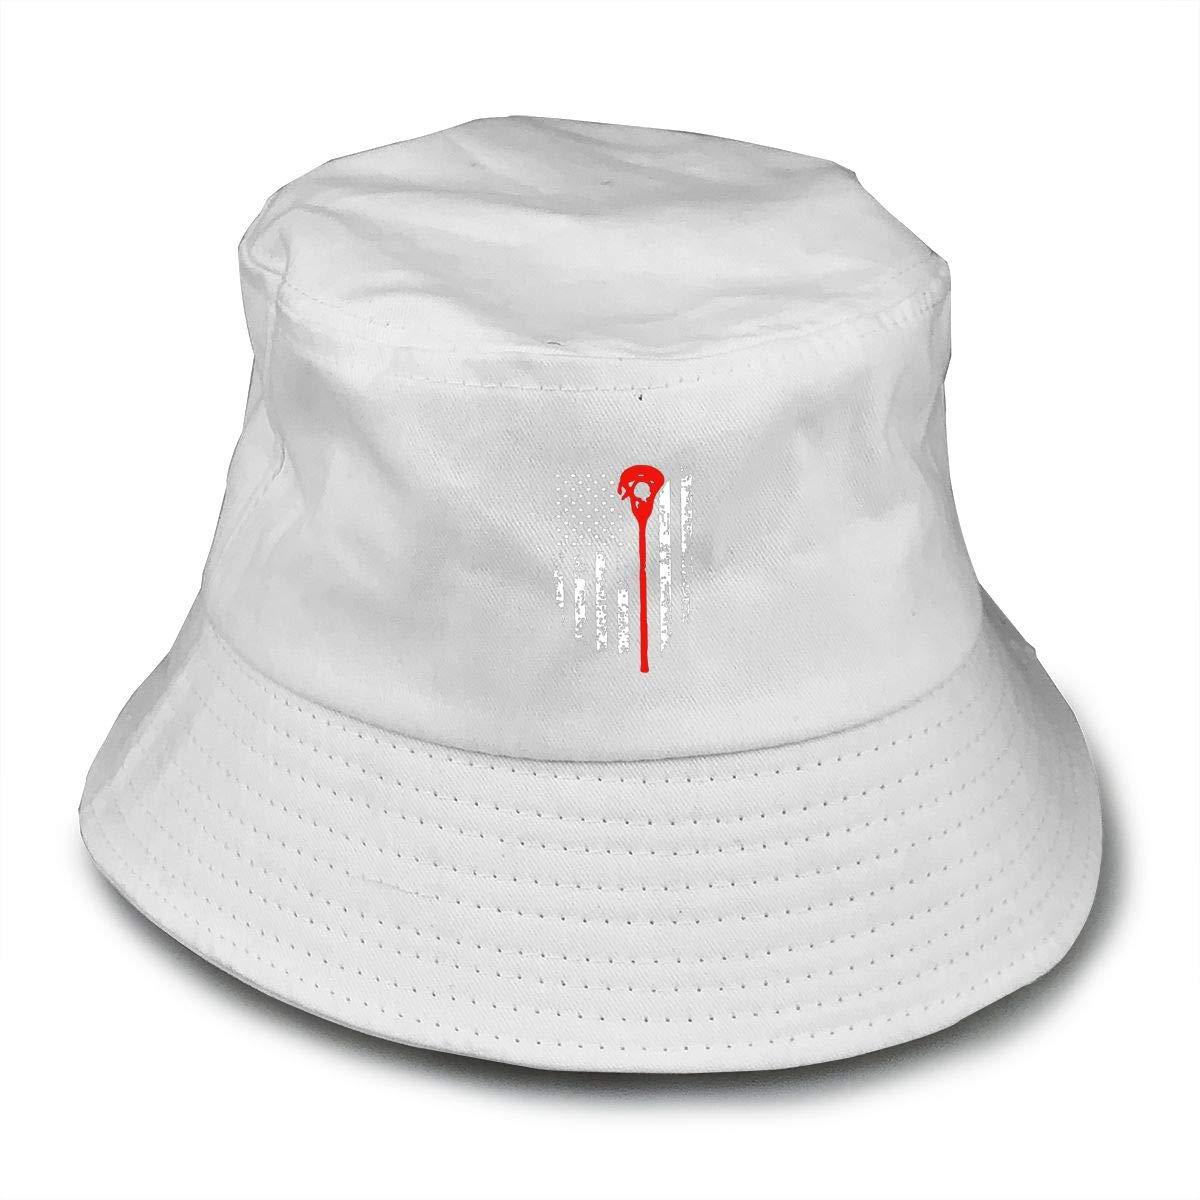 160e3c9b Hangren Lacrosse American Flag Bucket Hat Summer Fisherman Cap Foldable Sun  Protection Hat at Amazon Men's Clothing store: